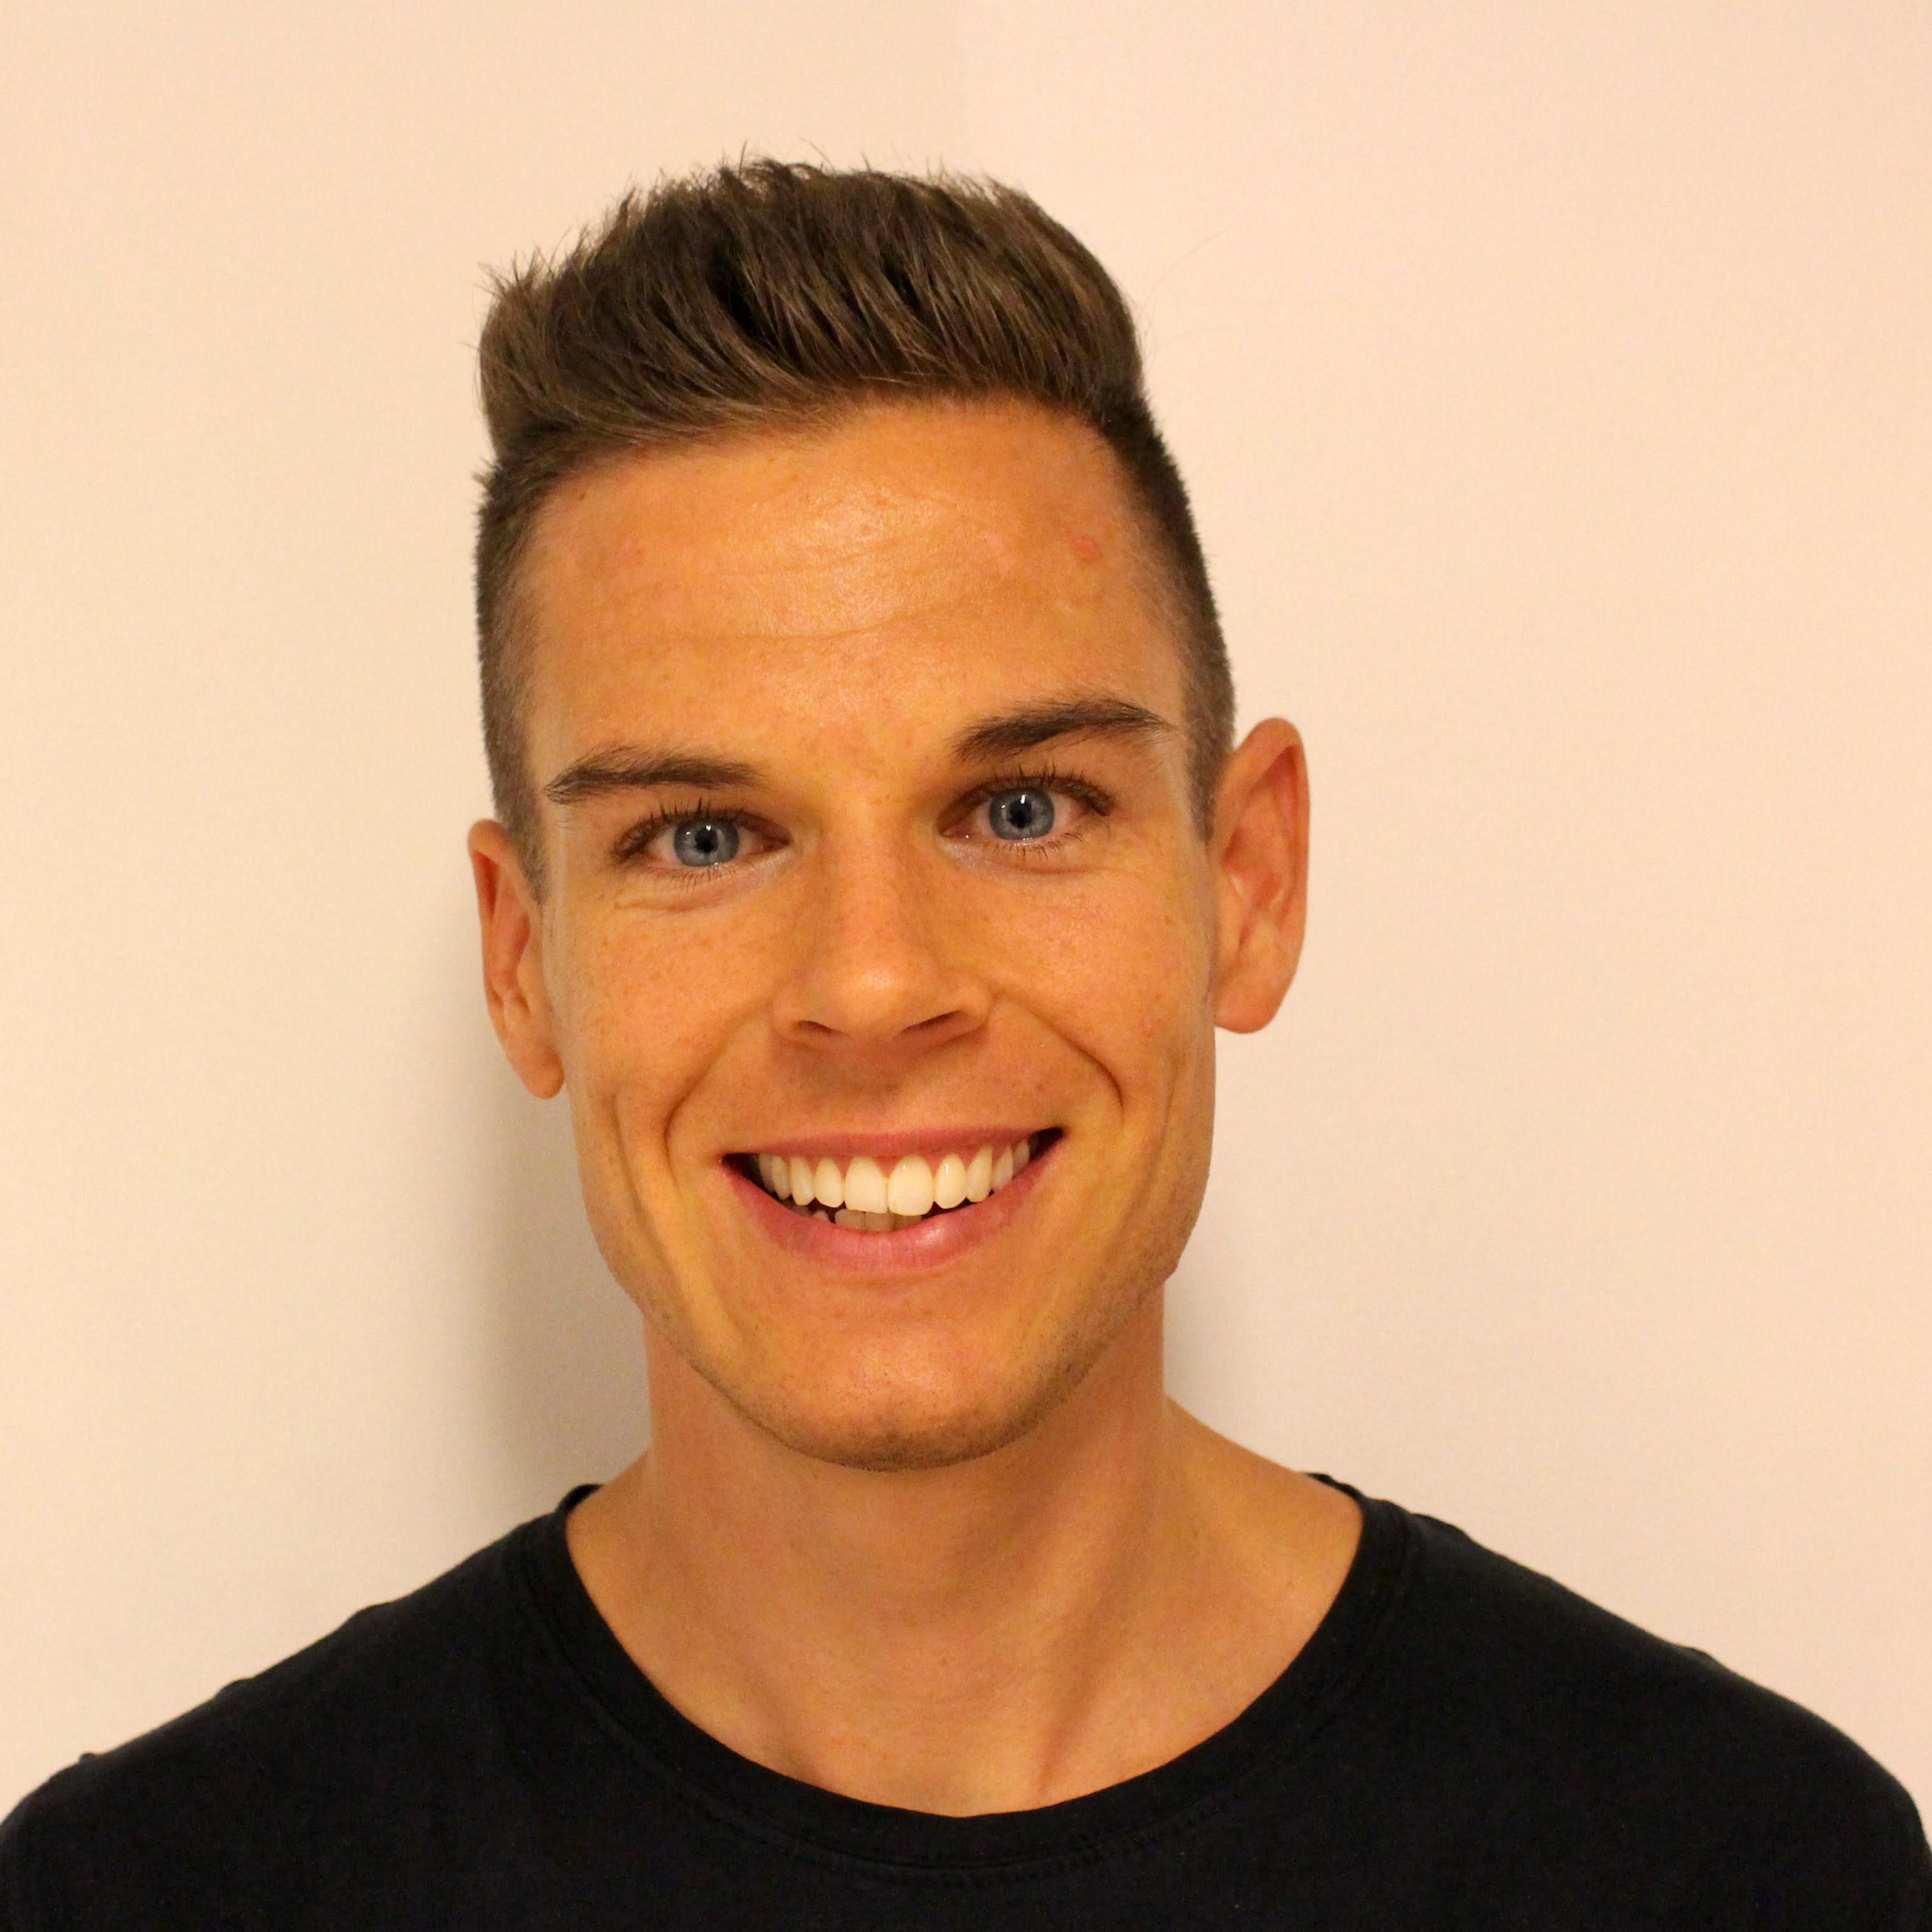 Jannik Friis - Juniortræner